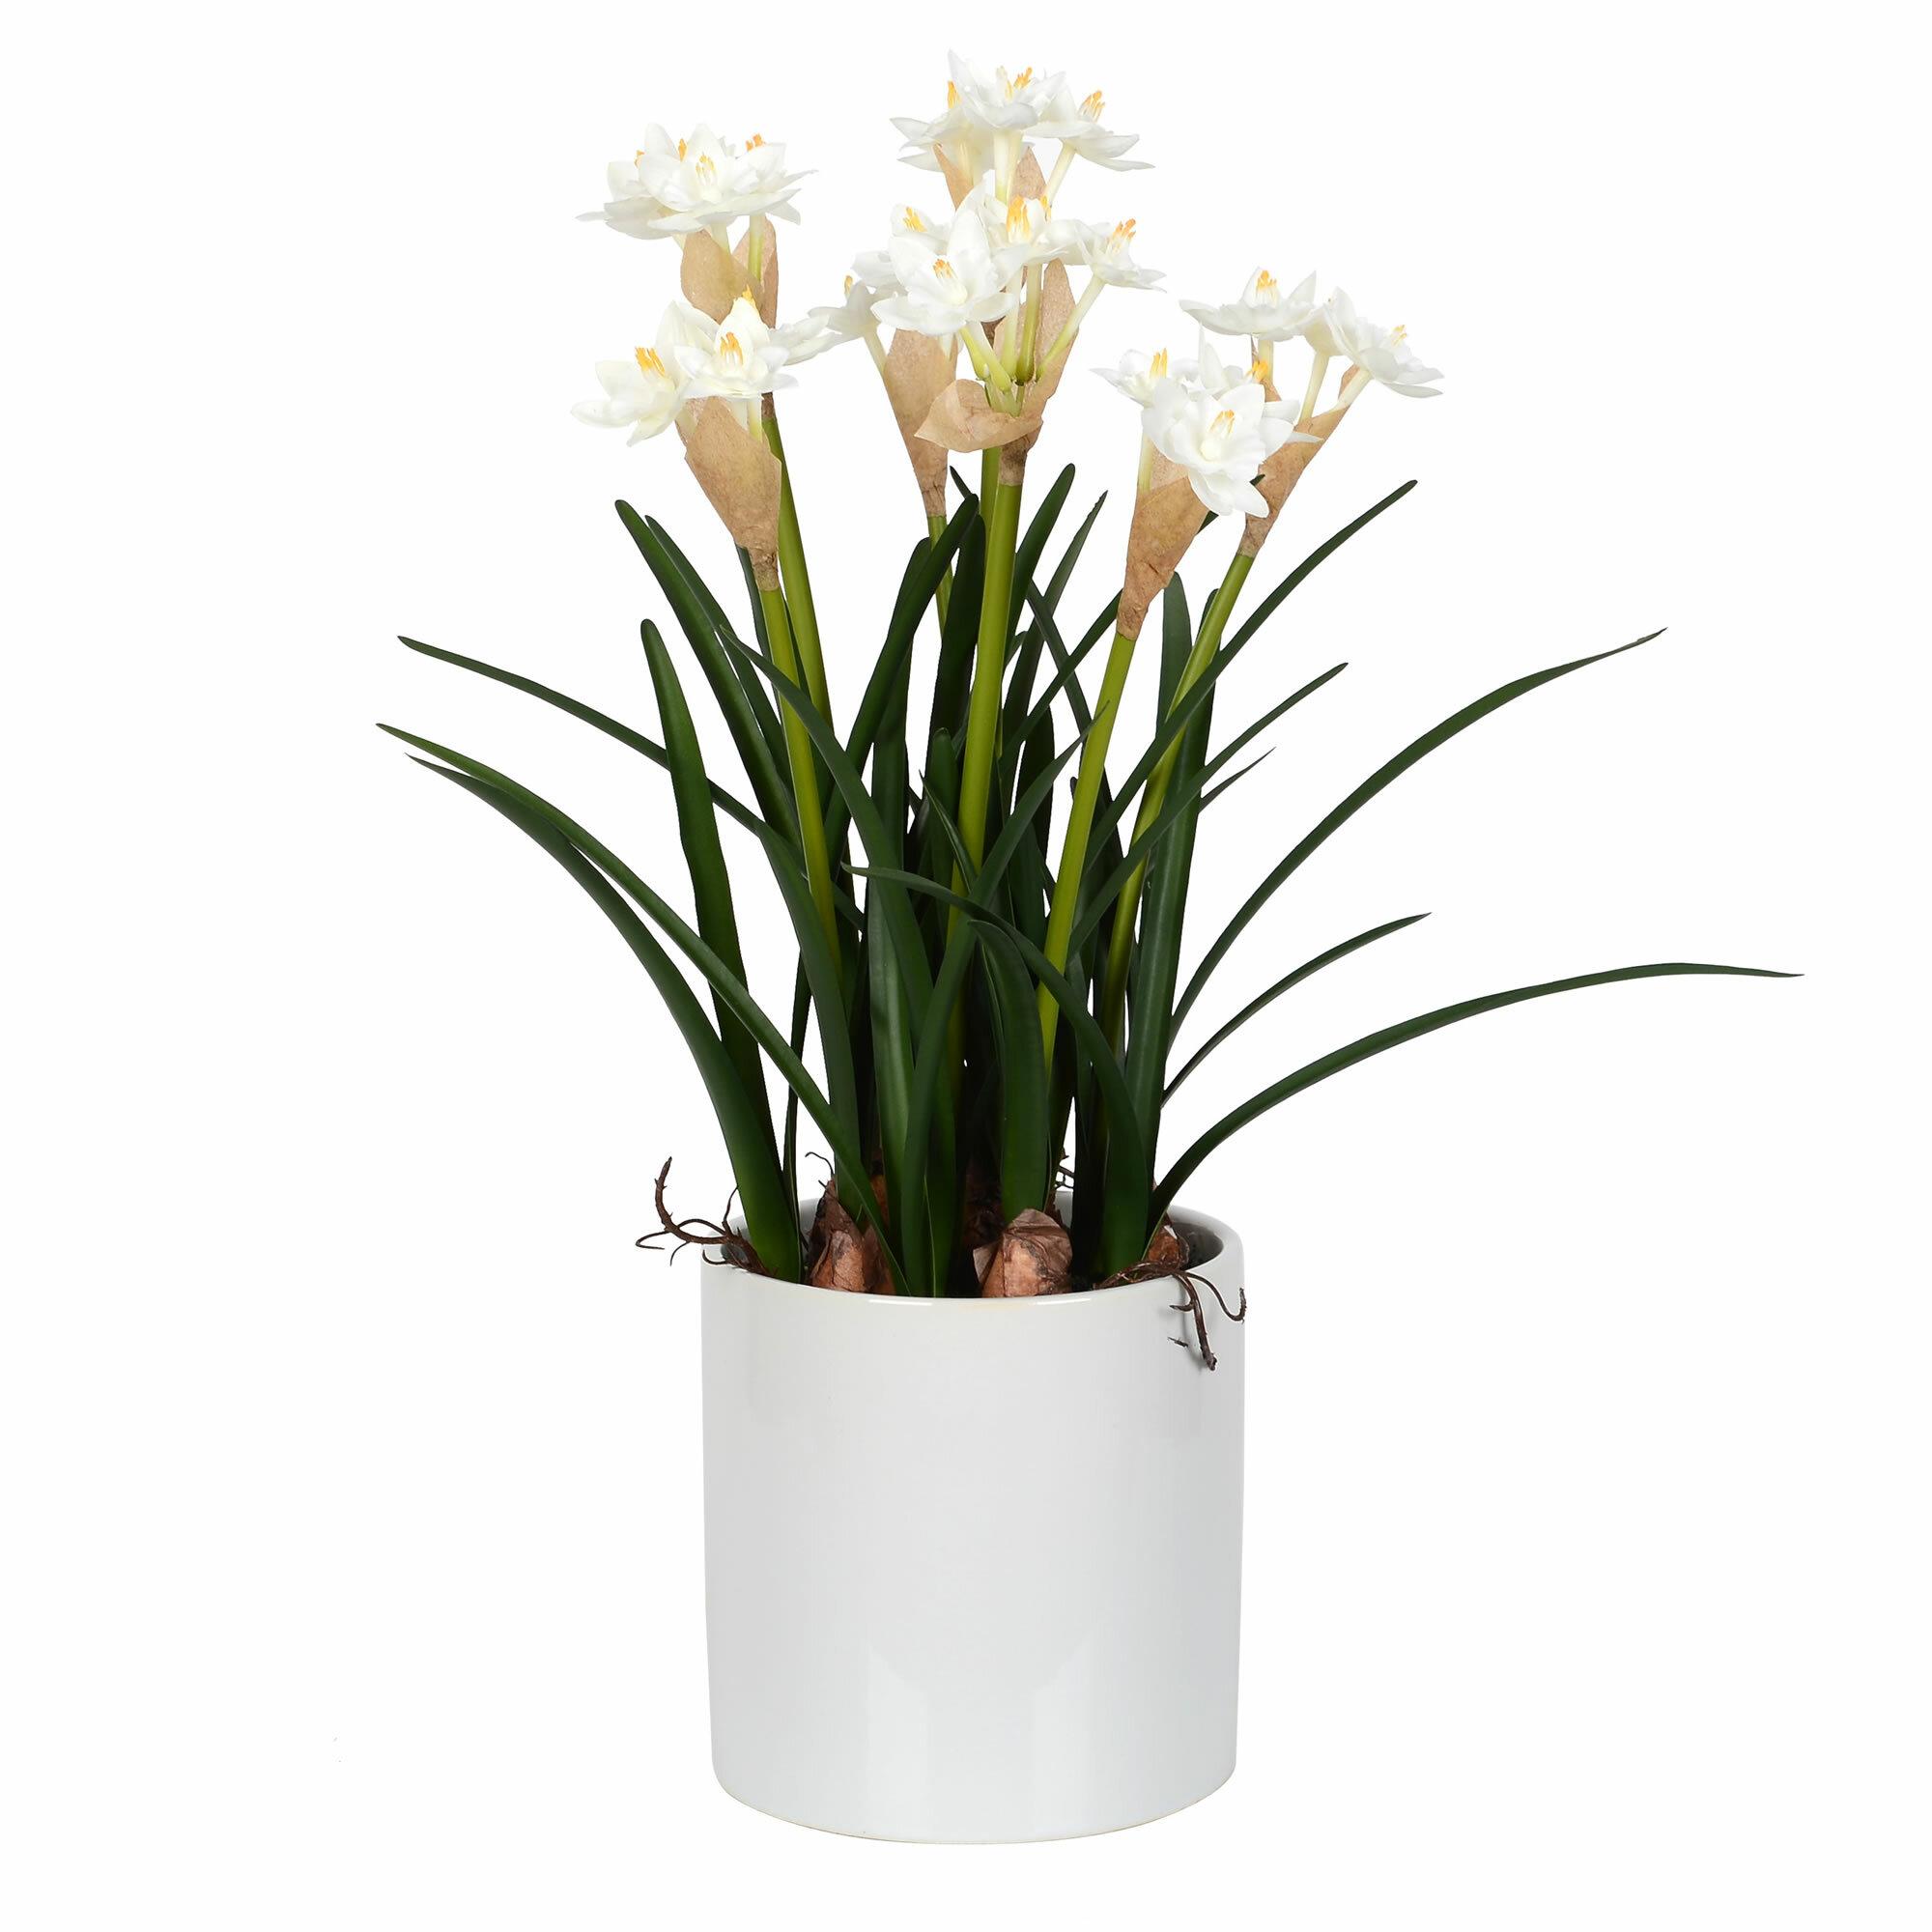 Rosalind Wheeler Daffodil Floral Arrangements And Centerpieces In Pot Wayfair